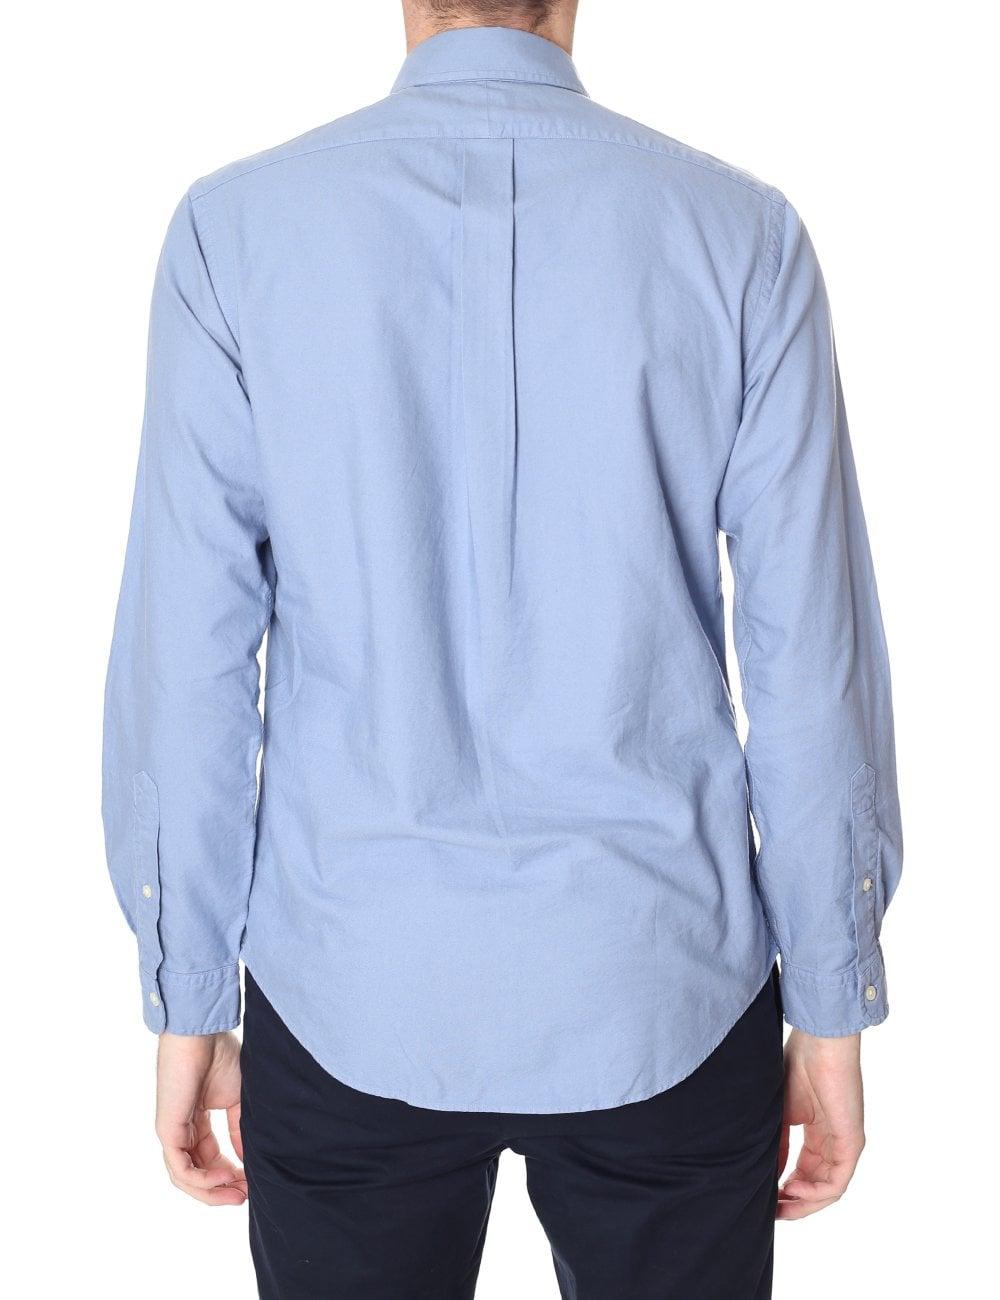 0163223cd98c1 Polo Ralph Lauren Men s Slim Fit Long Sleeve Sport Shirt